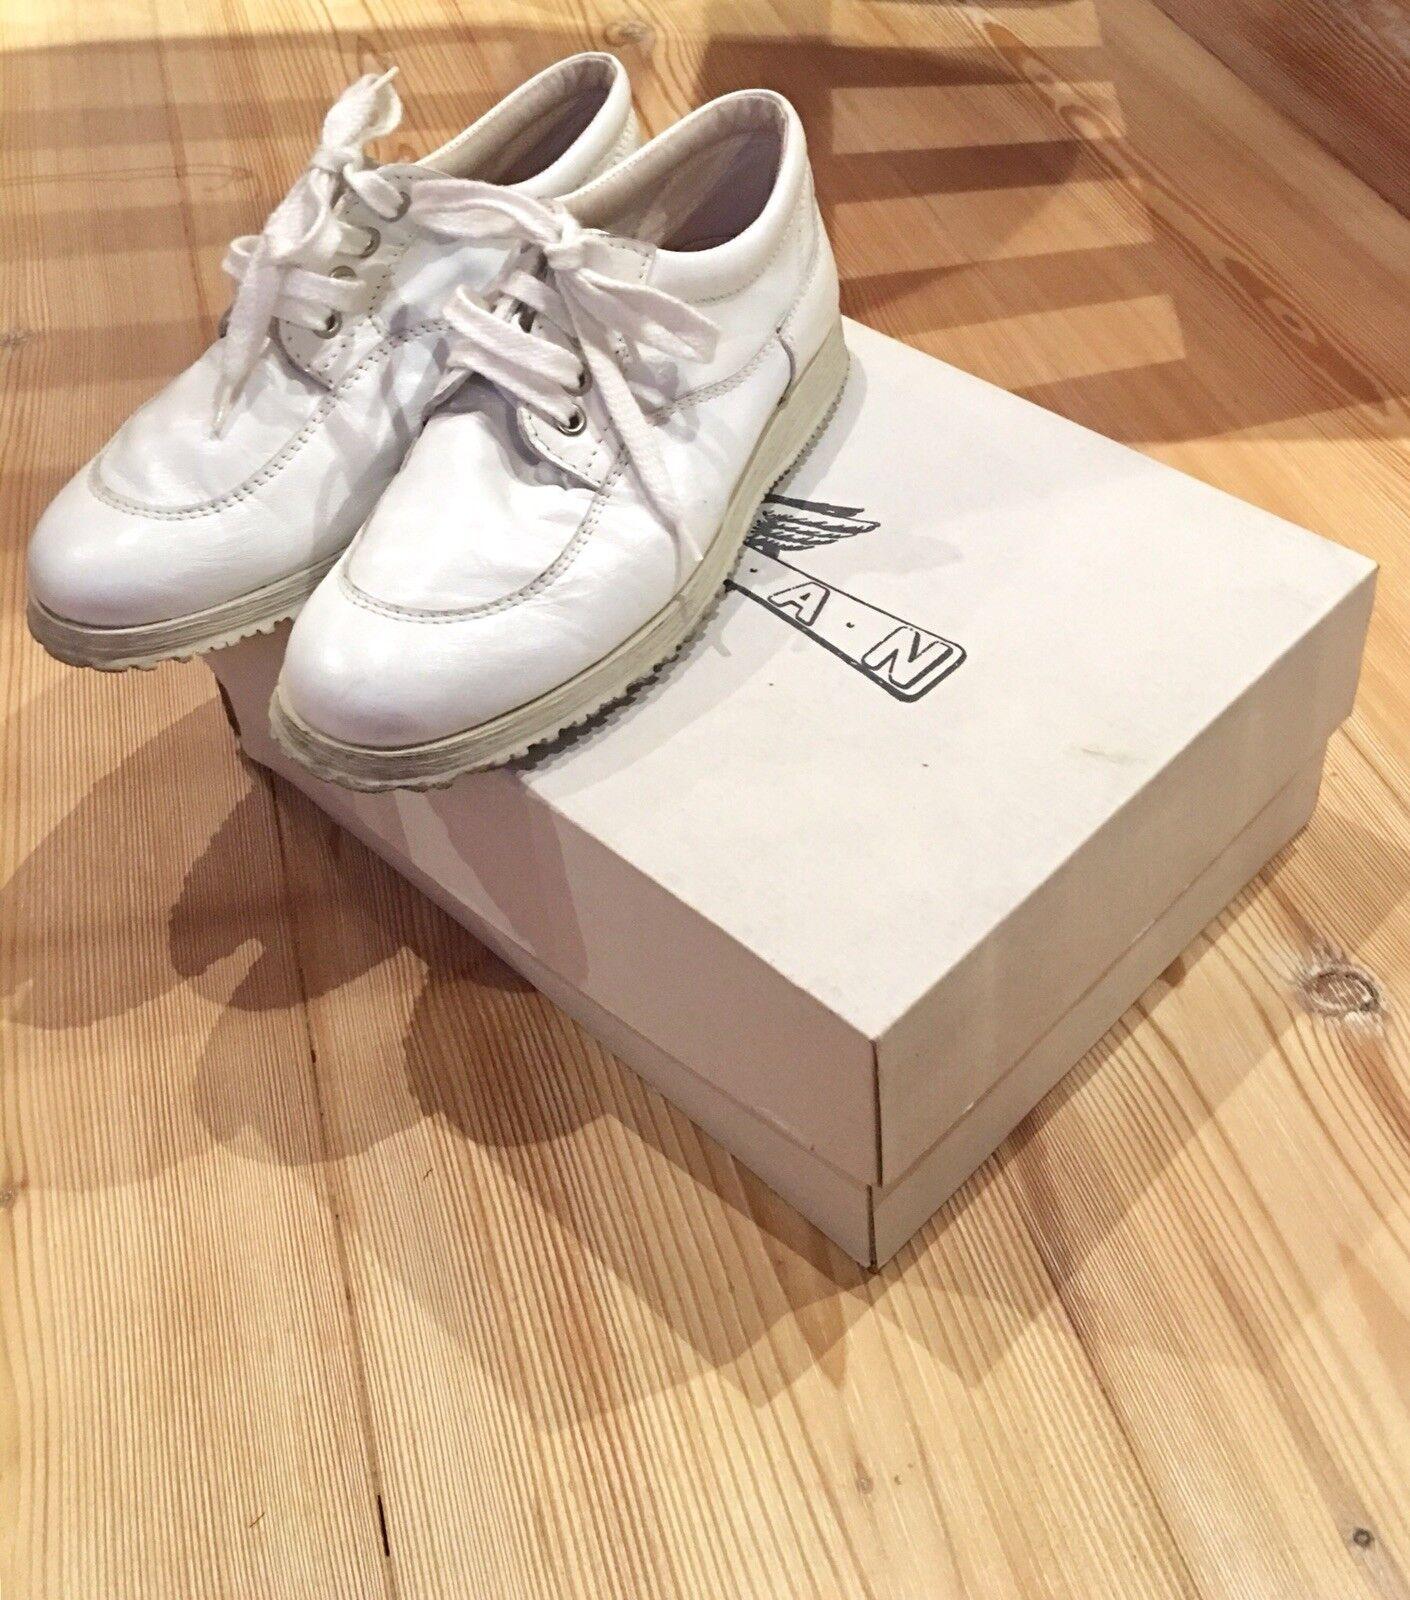 scarpe hogan donna pelle bianca lucida n. 35